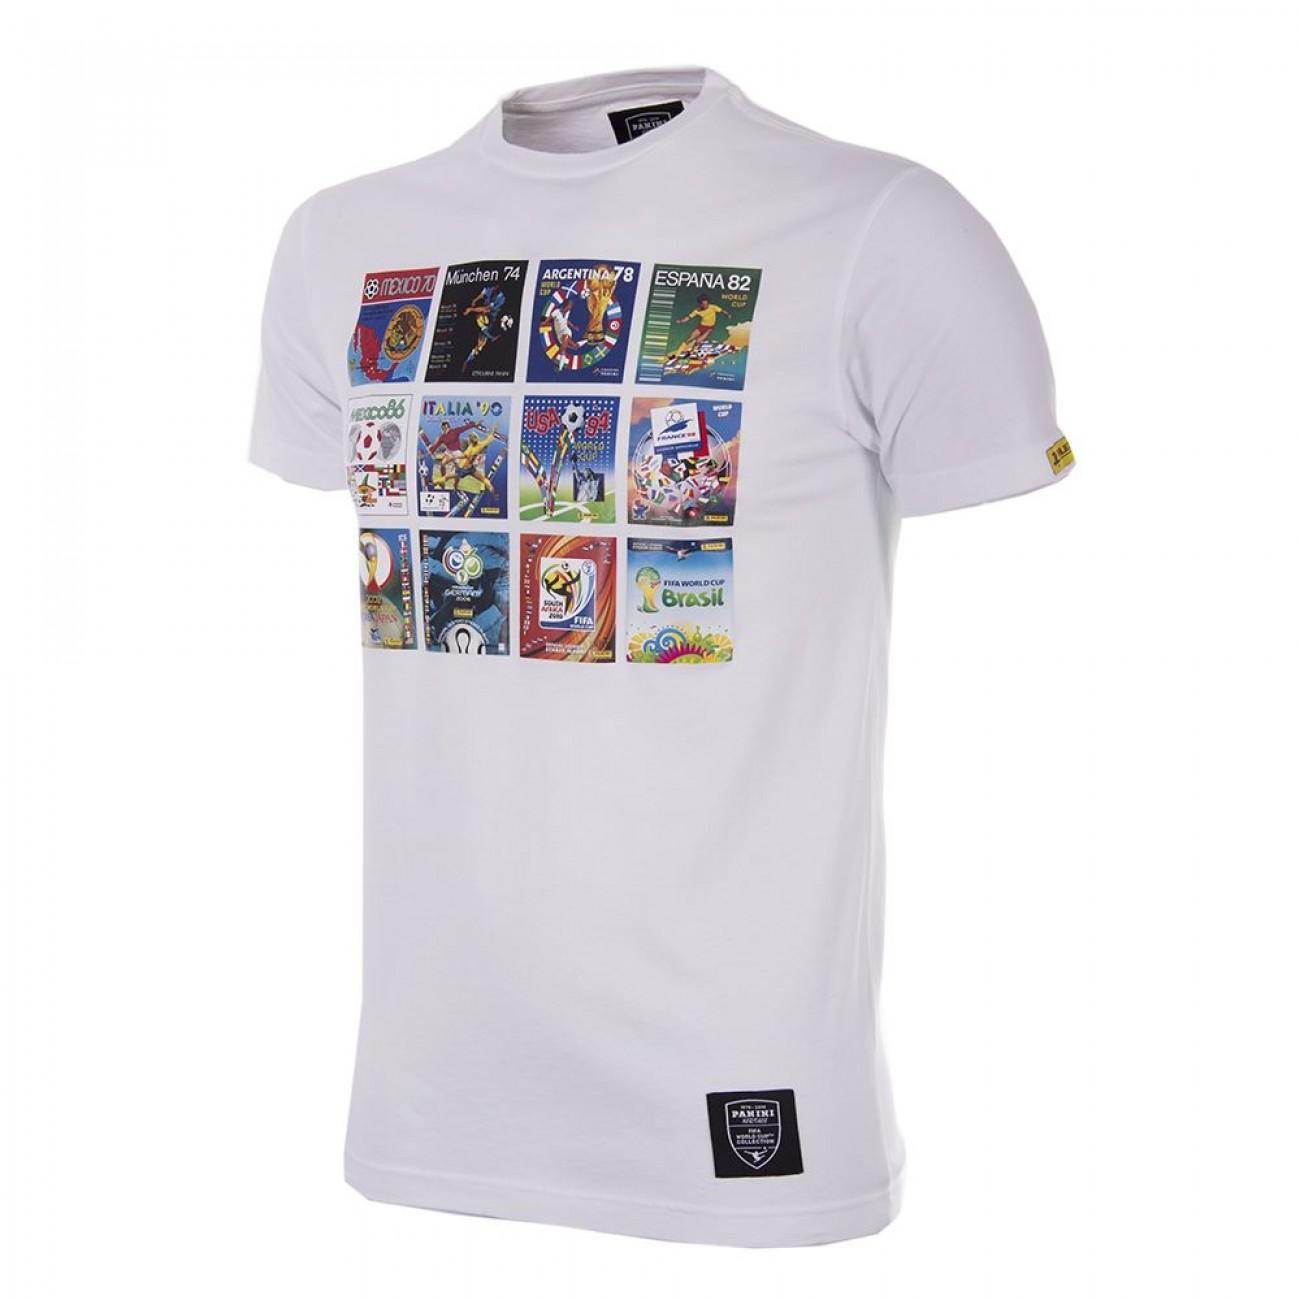 best website 9d9ab 0adc7 World Cup T Shirts Cheap | Azərbaycan Dillər Universiteti